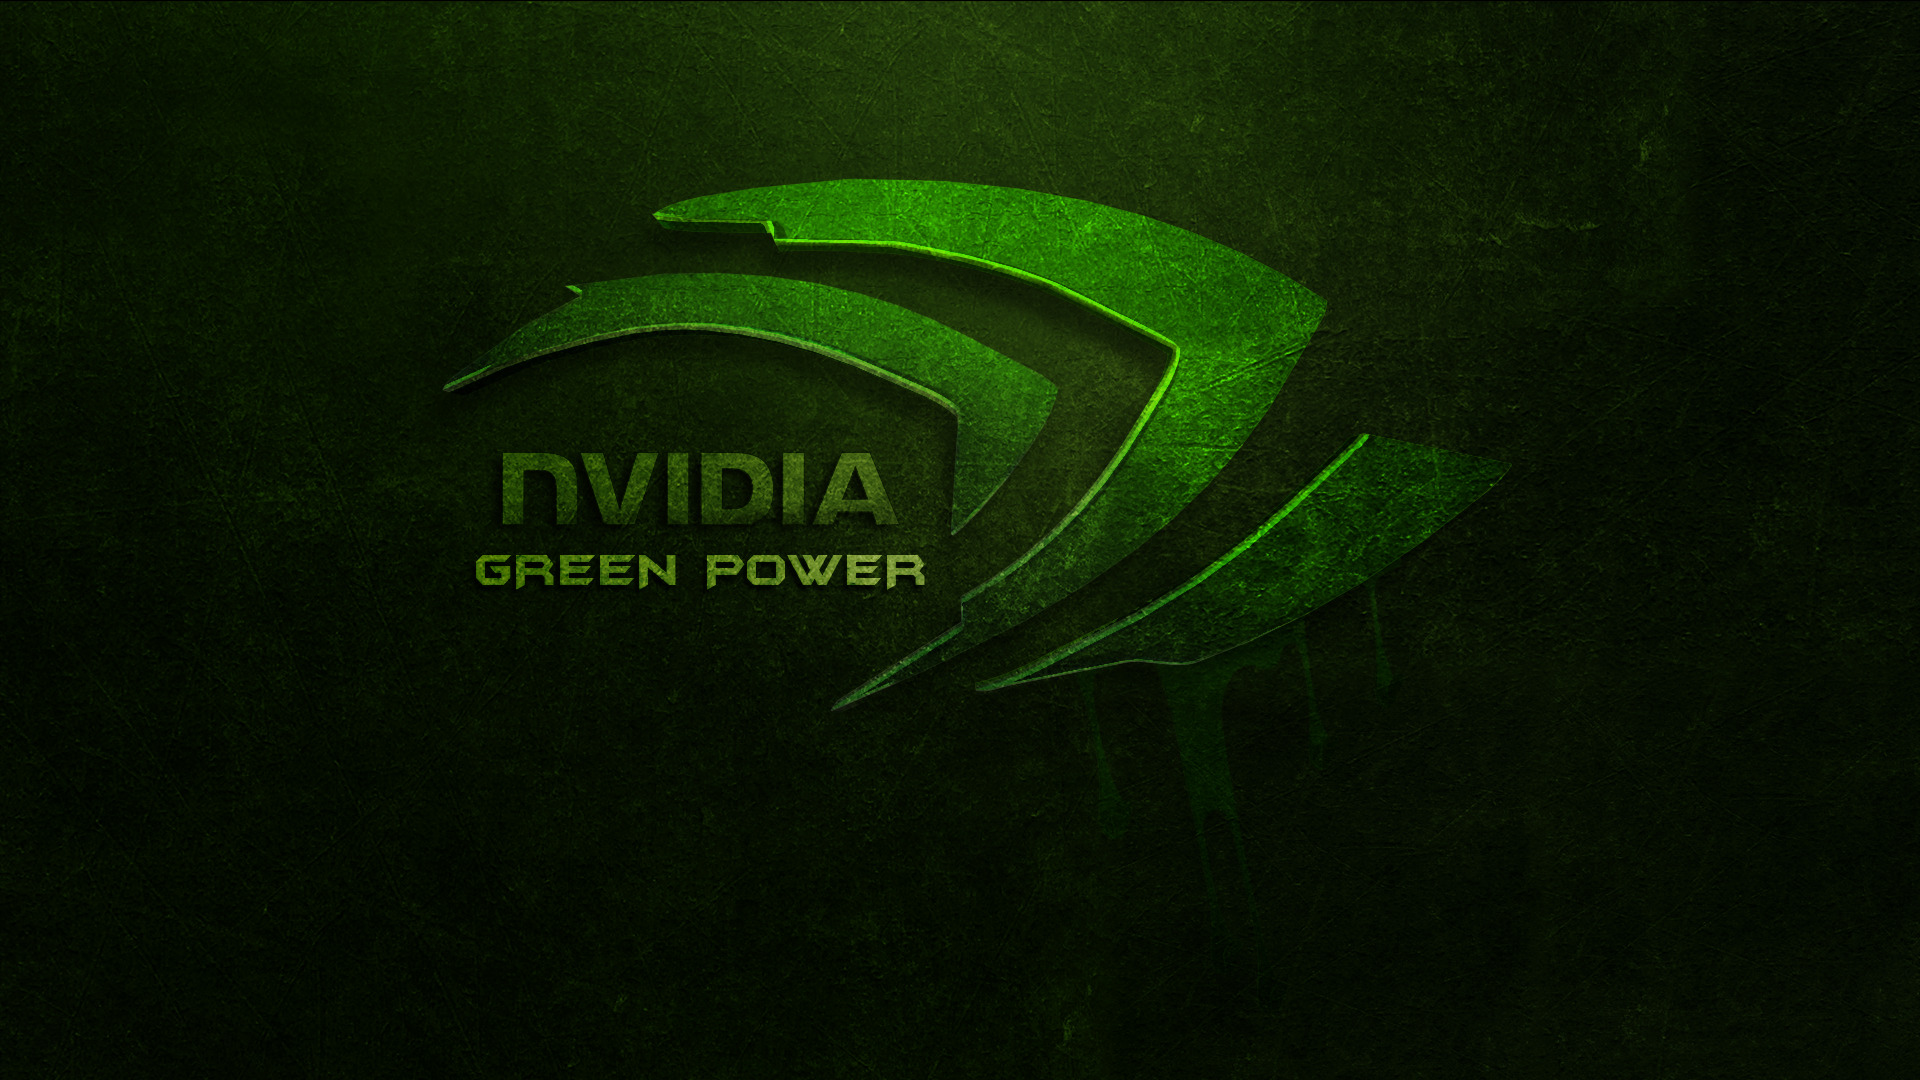 Nvidia green power wallpaper by atemate on deviantart - 1920x1080 wallpaper nvidia ...